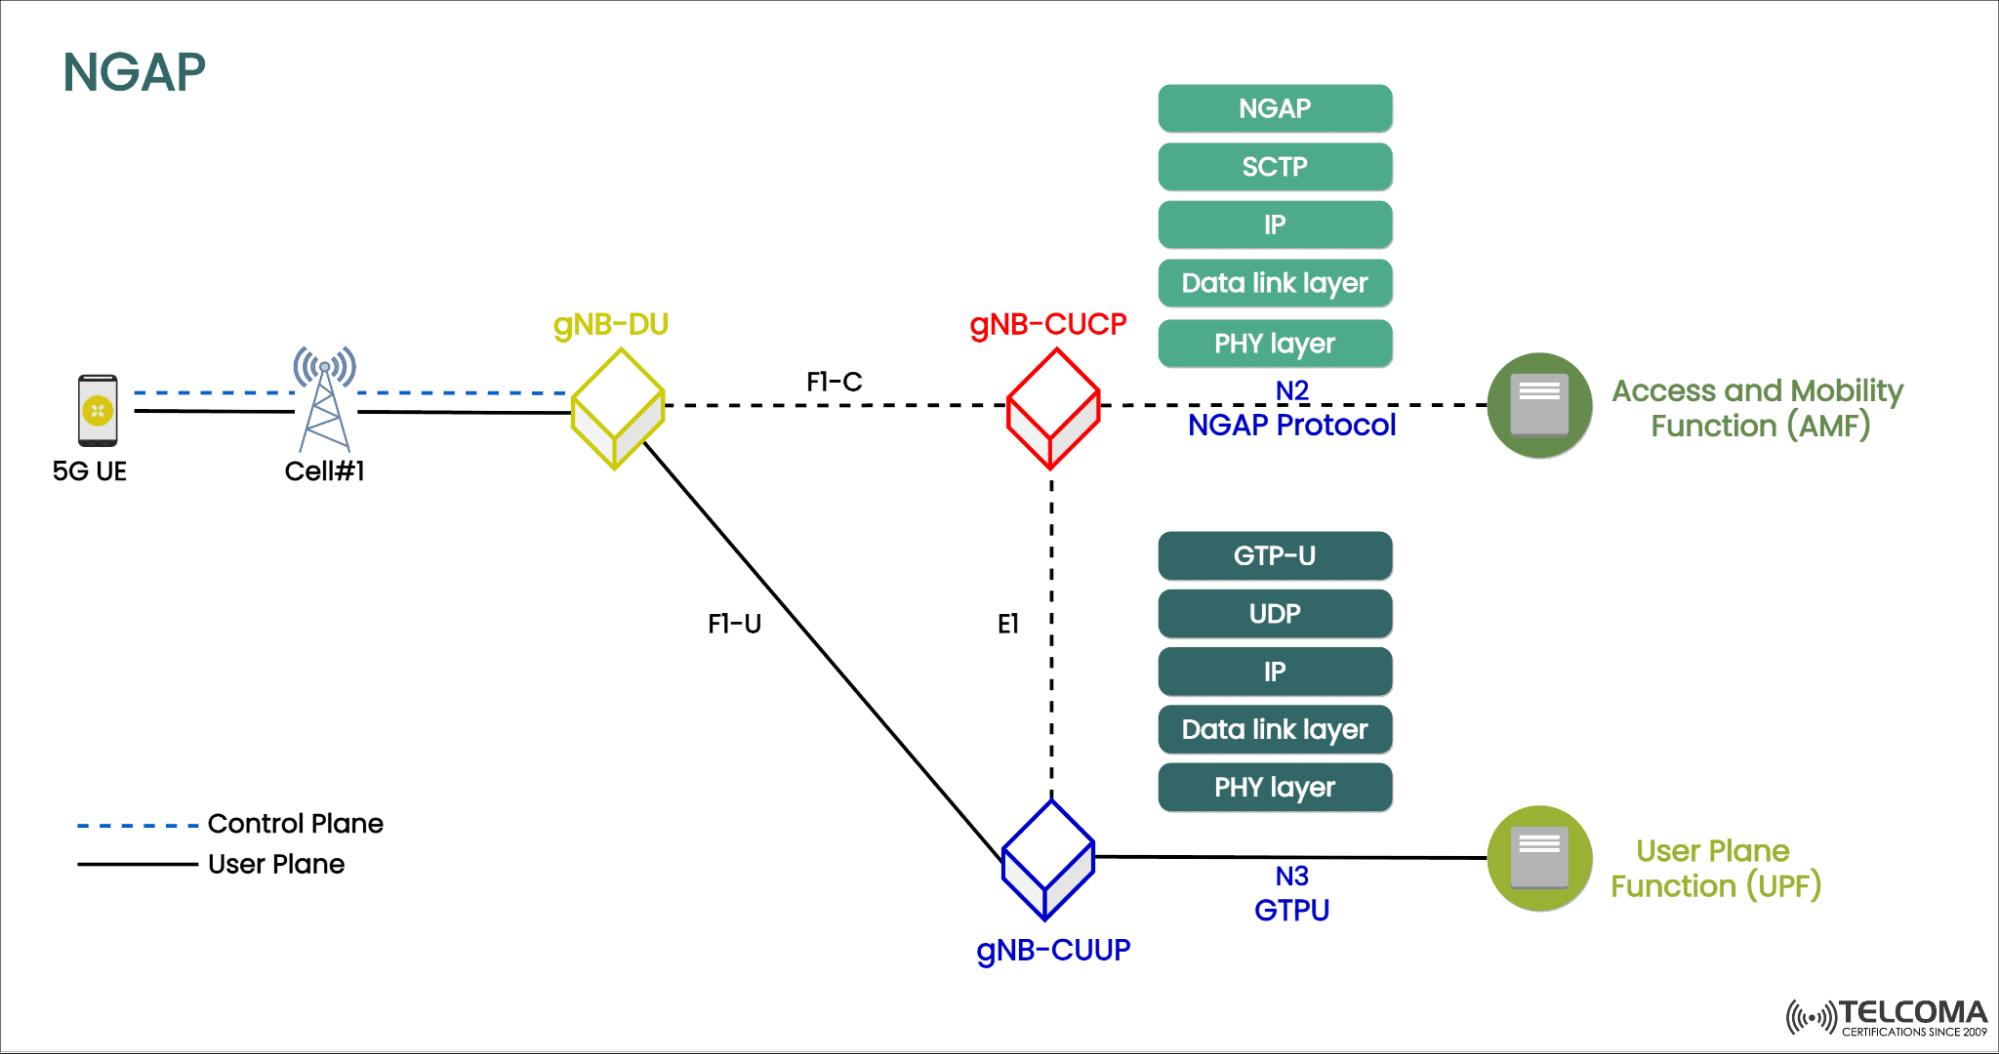 NGAP- Next-Generation Application Protocol